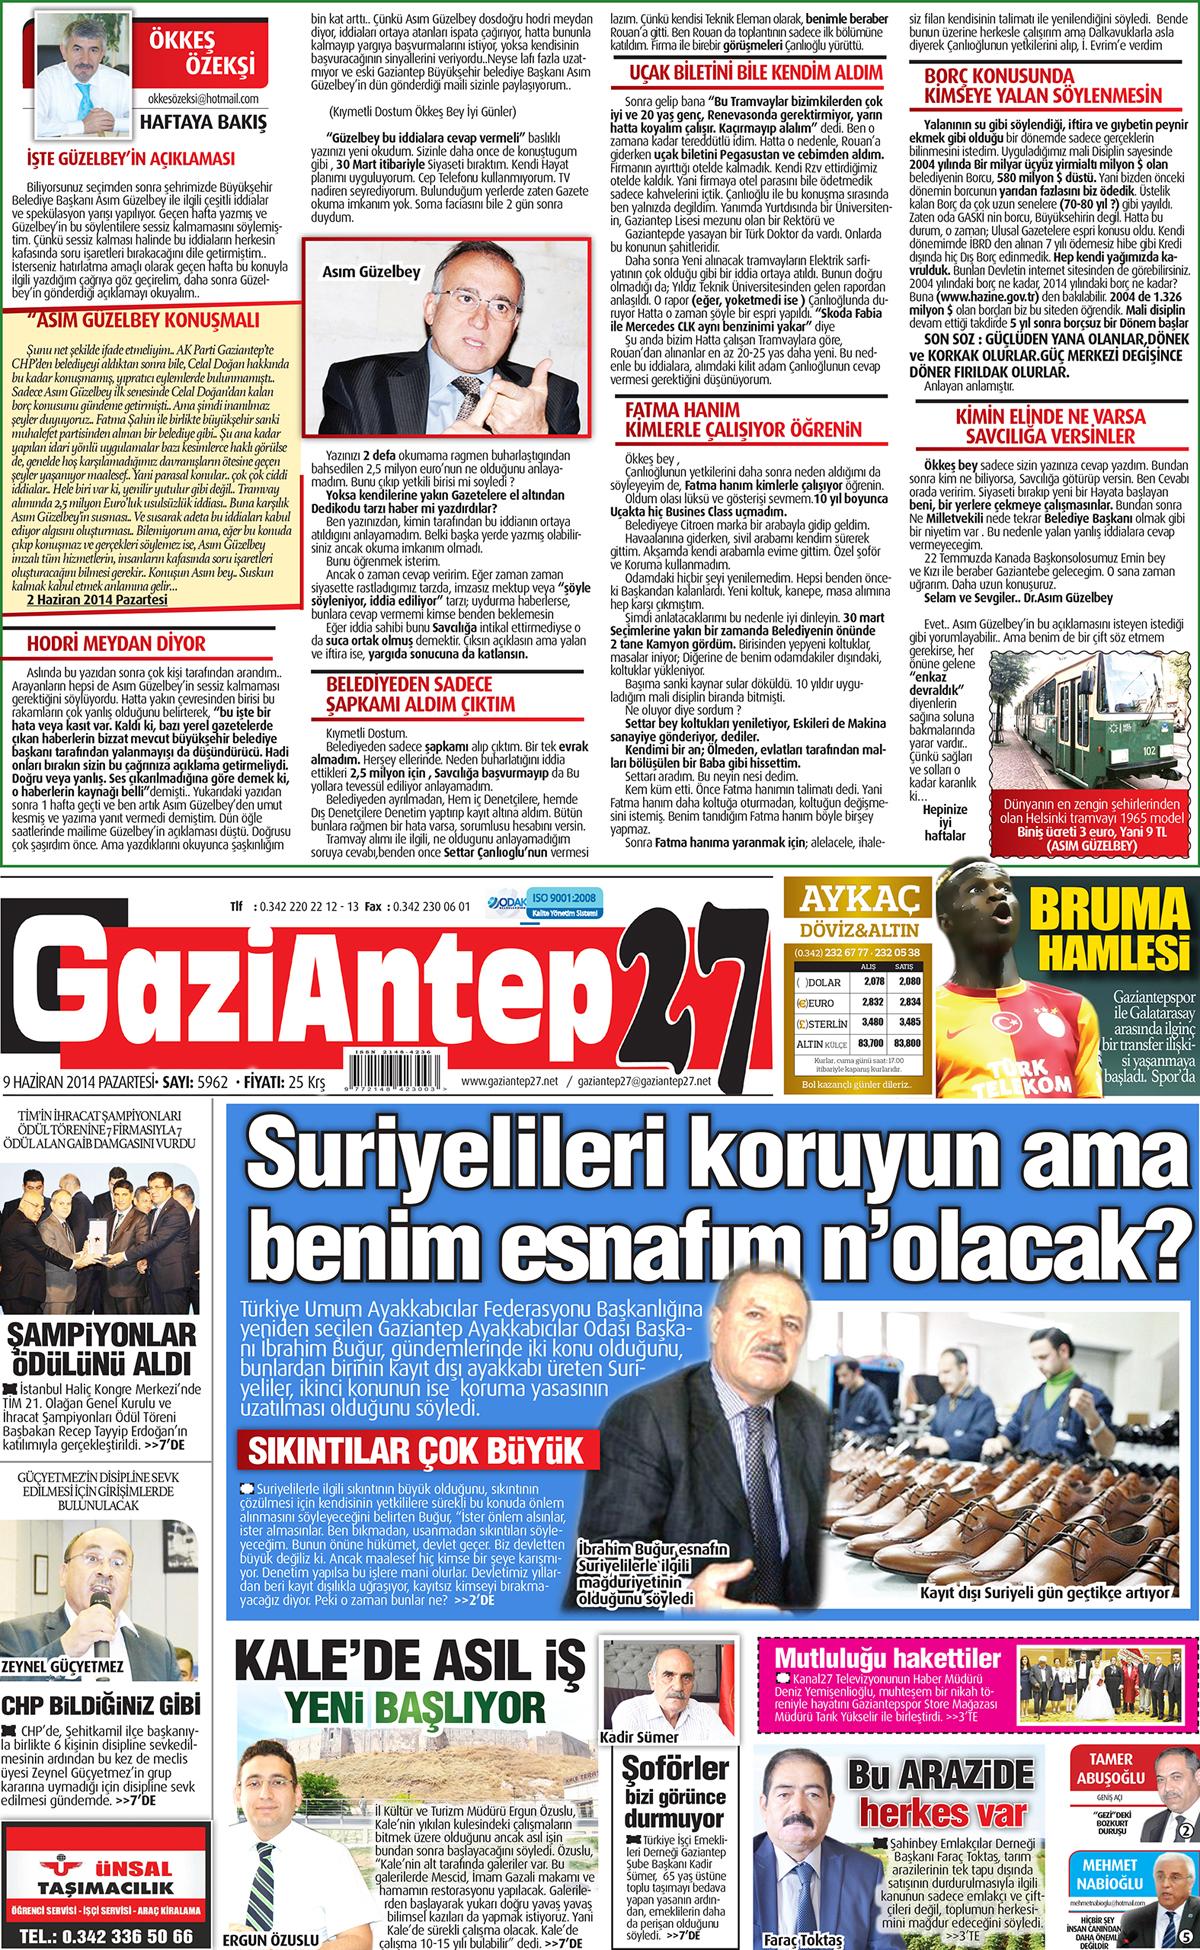 9 HAZİRAN 2014 PAZARTESİ SAYFALARI 2